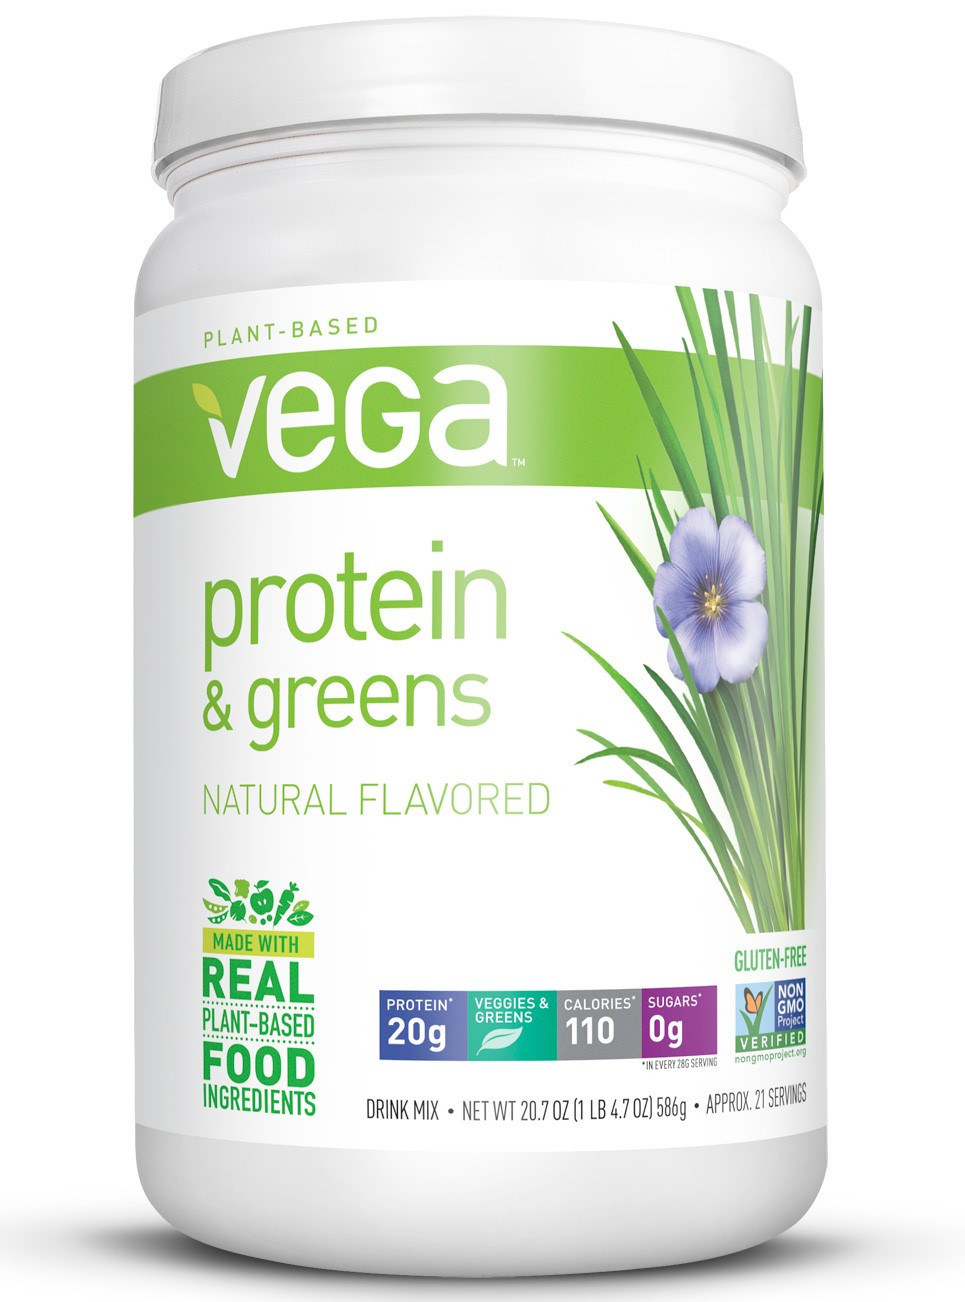 Vega Organic Protein And Greens  Vega Protein & Greens Powder Natural 1 29 Lb